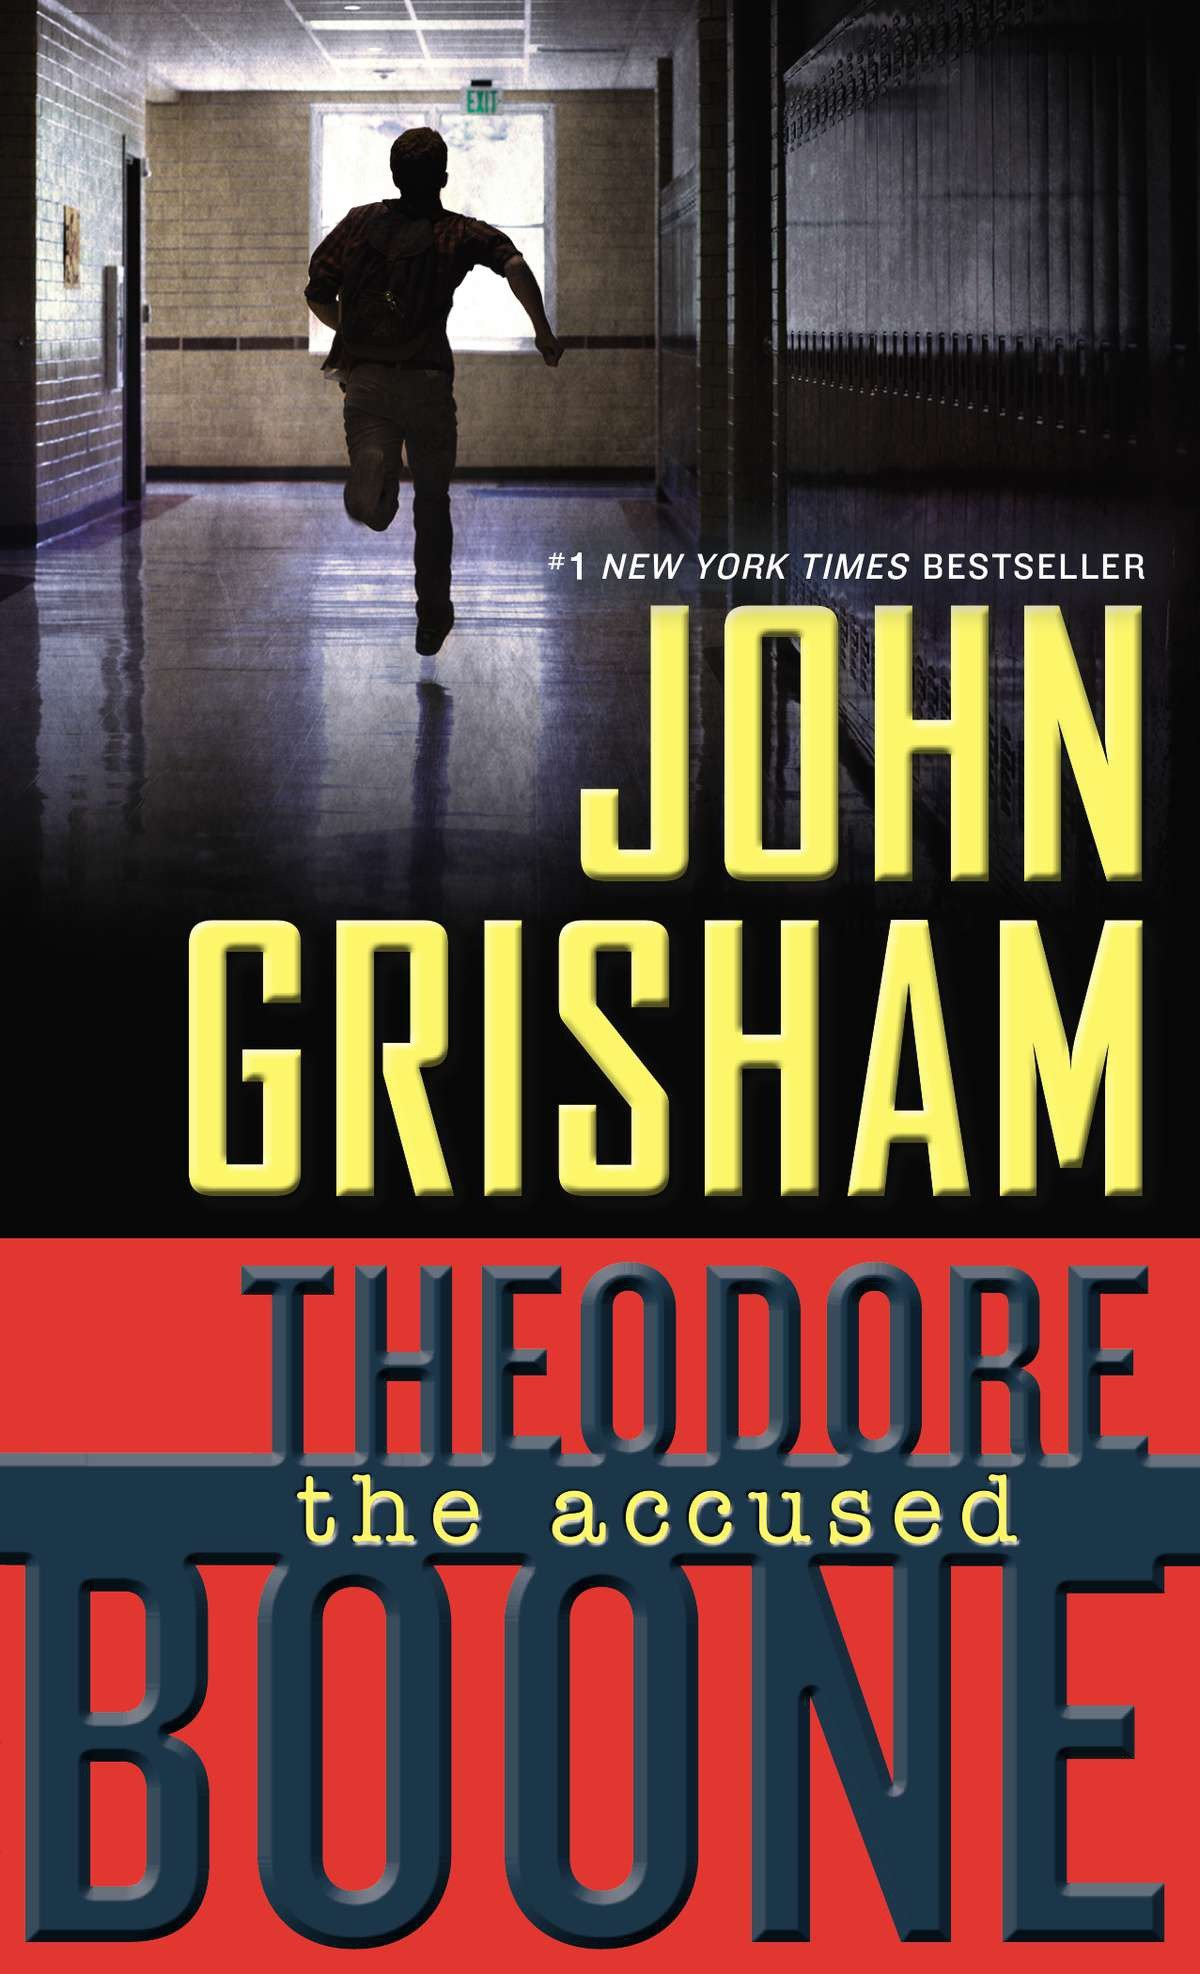 Theodore Boone: The Accused eBook by John Grisham ...